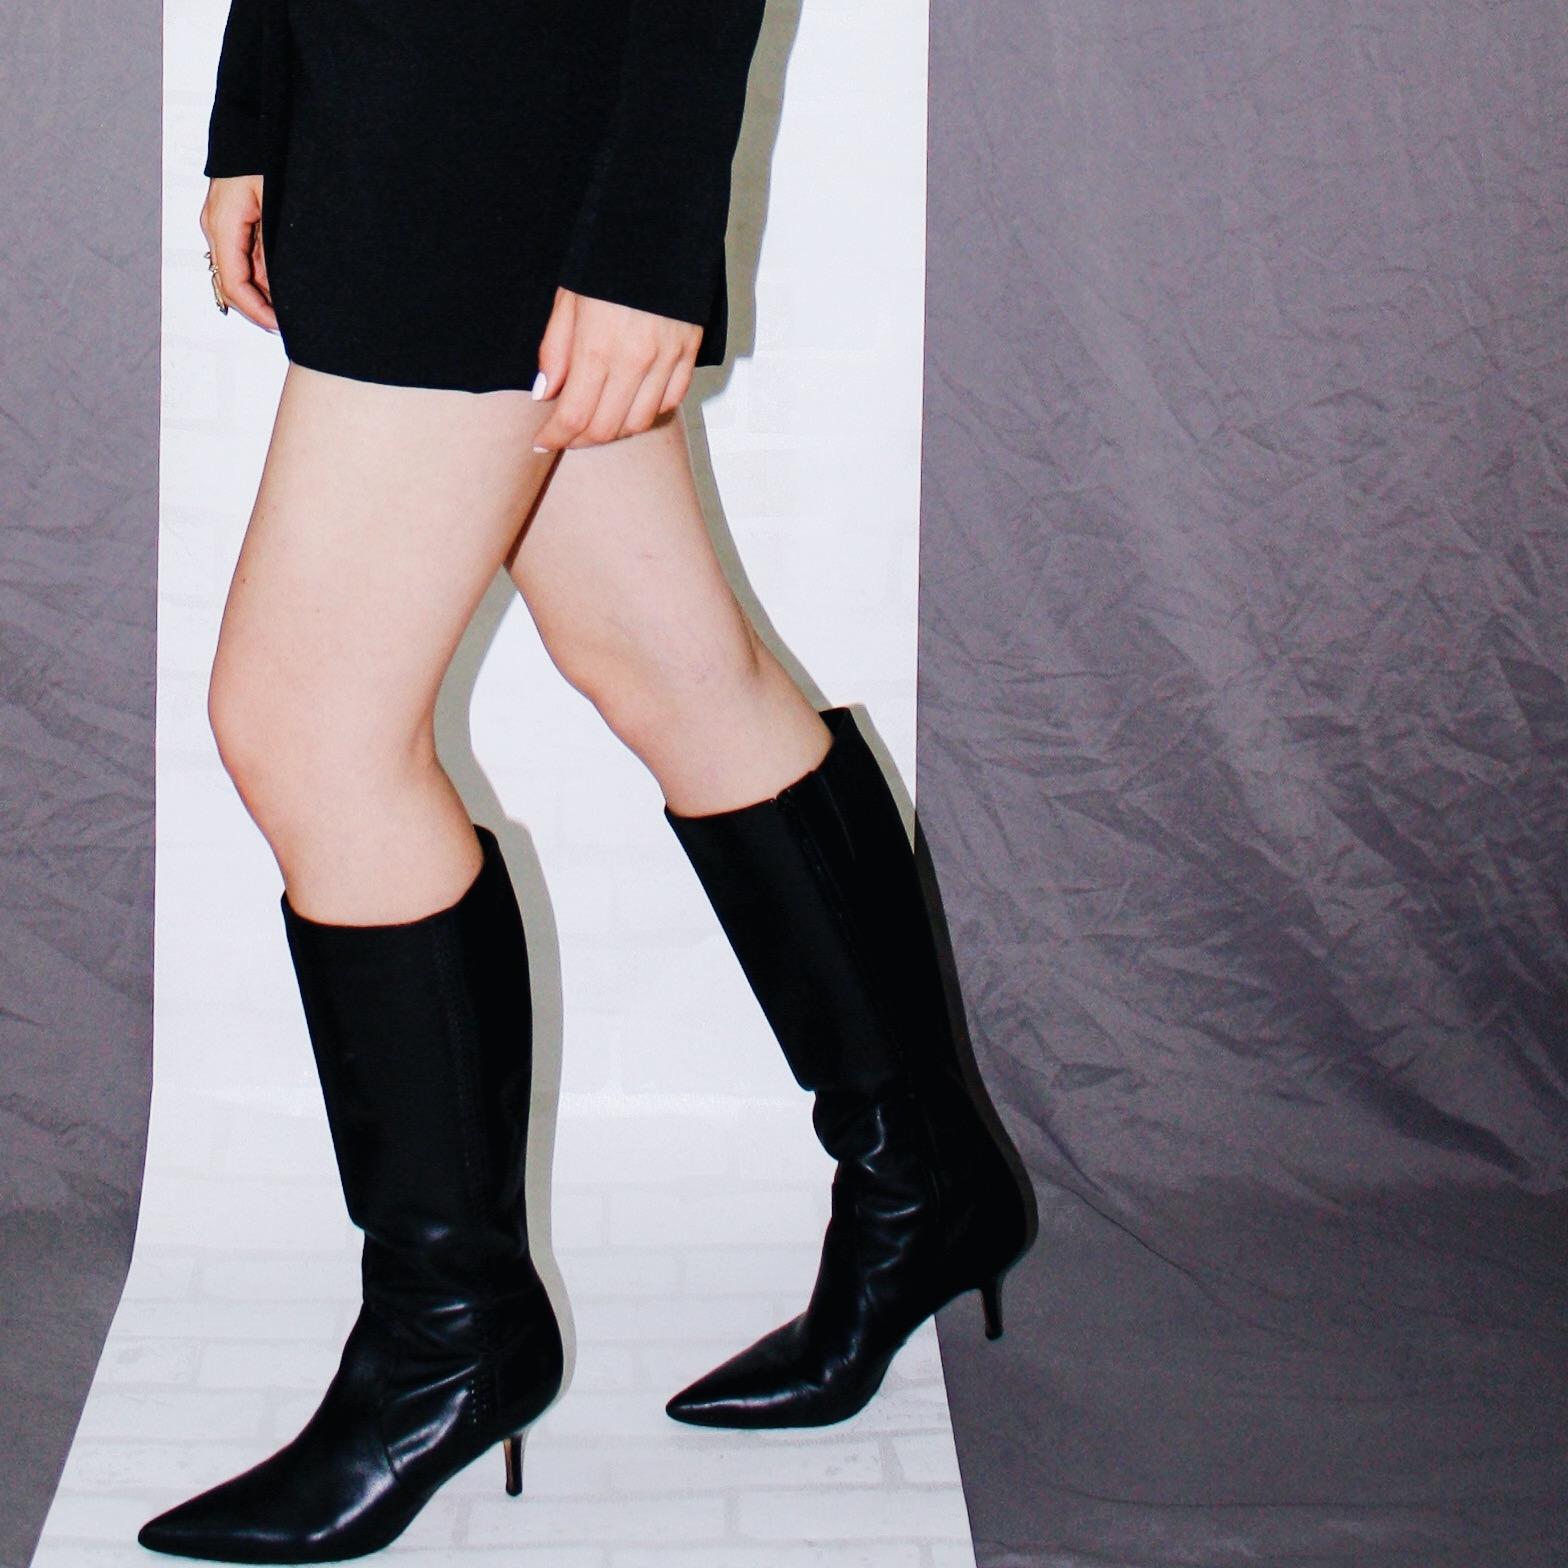 fall is here boots leather helmut lang blazer dress belts black 6